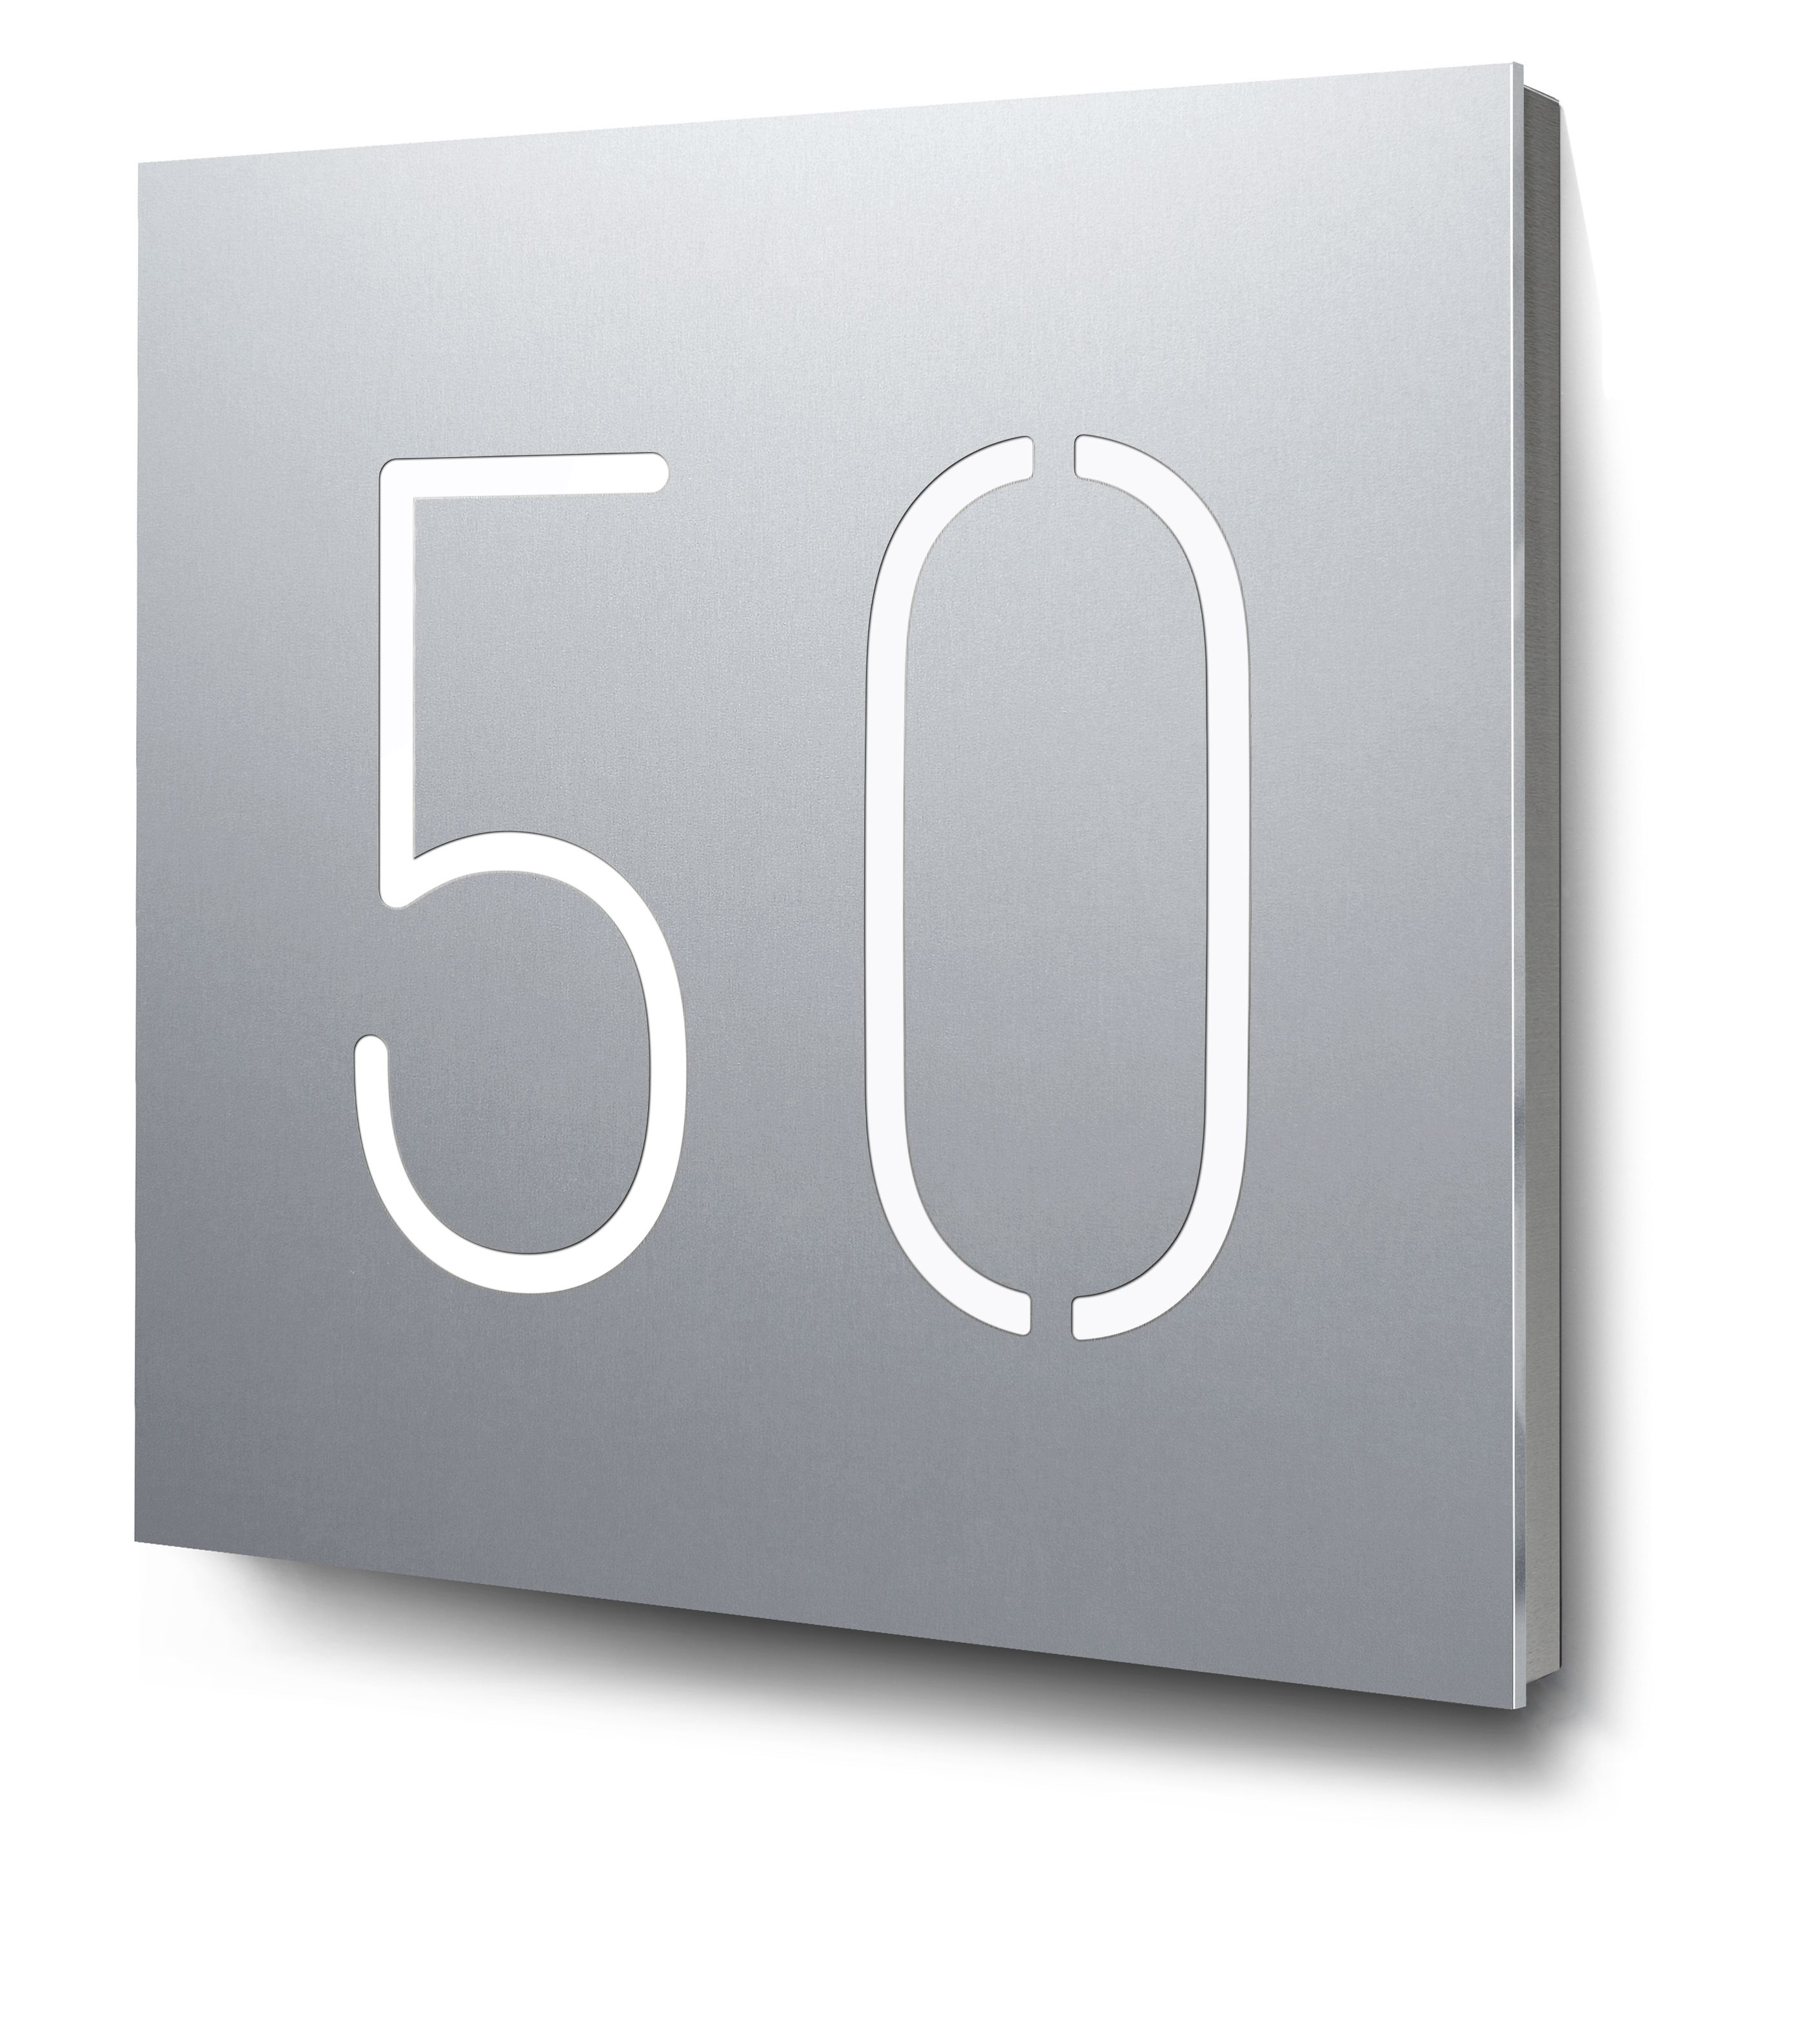 hausnummer zweieistellig beleuchtet in aluminium hausnummer hausnummernschild d mmerungsschal. Black Bedroom Furniture Sets. Home Design Ideas